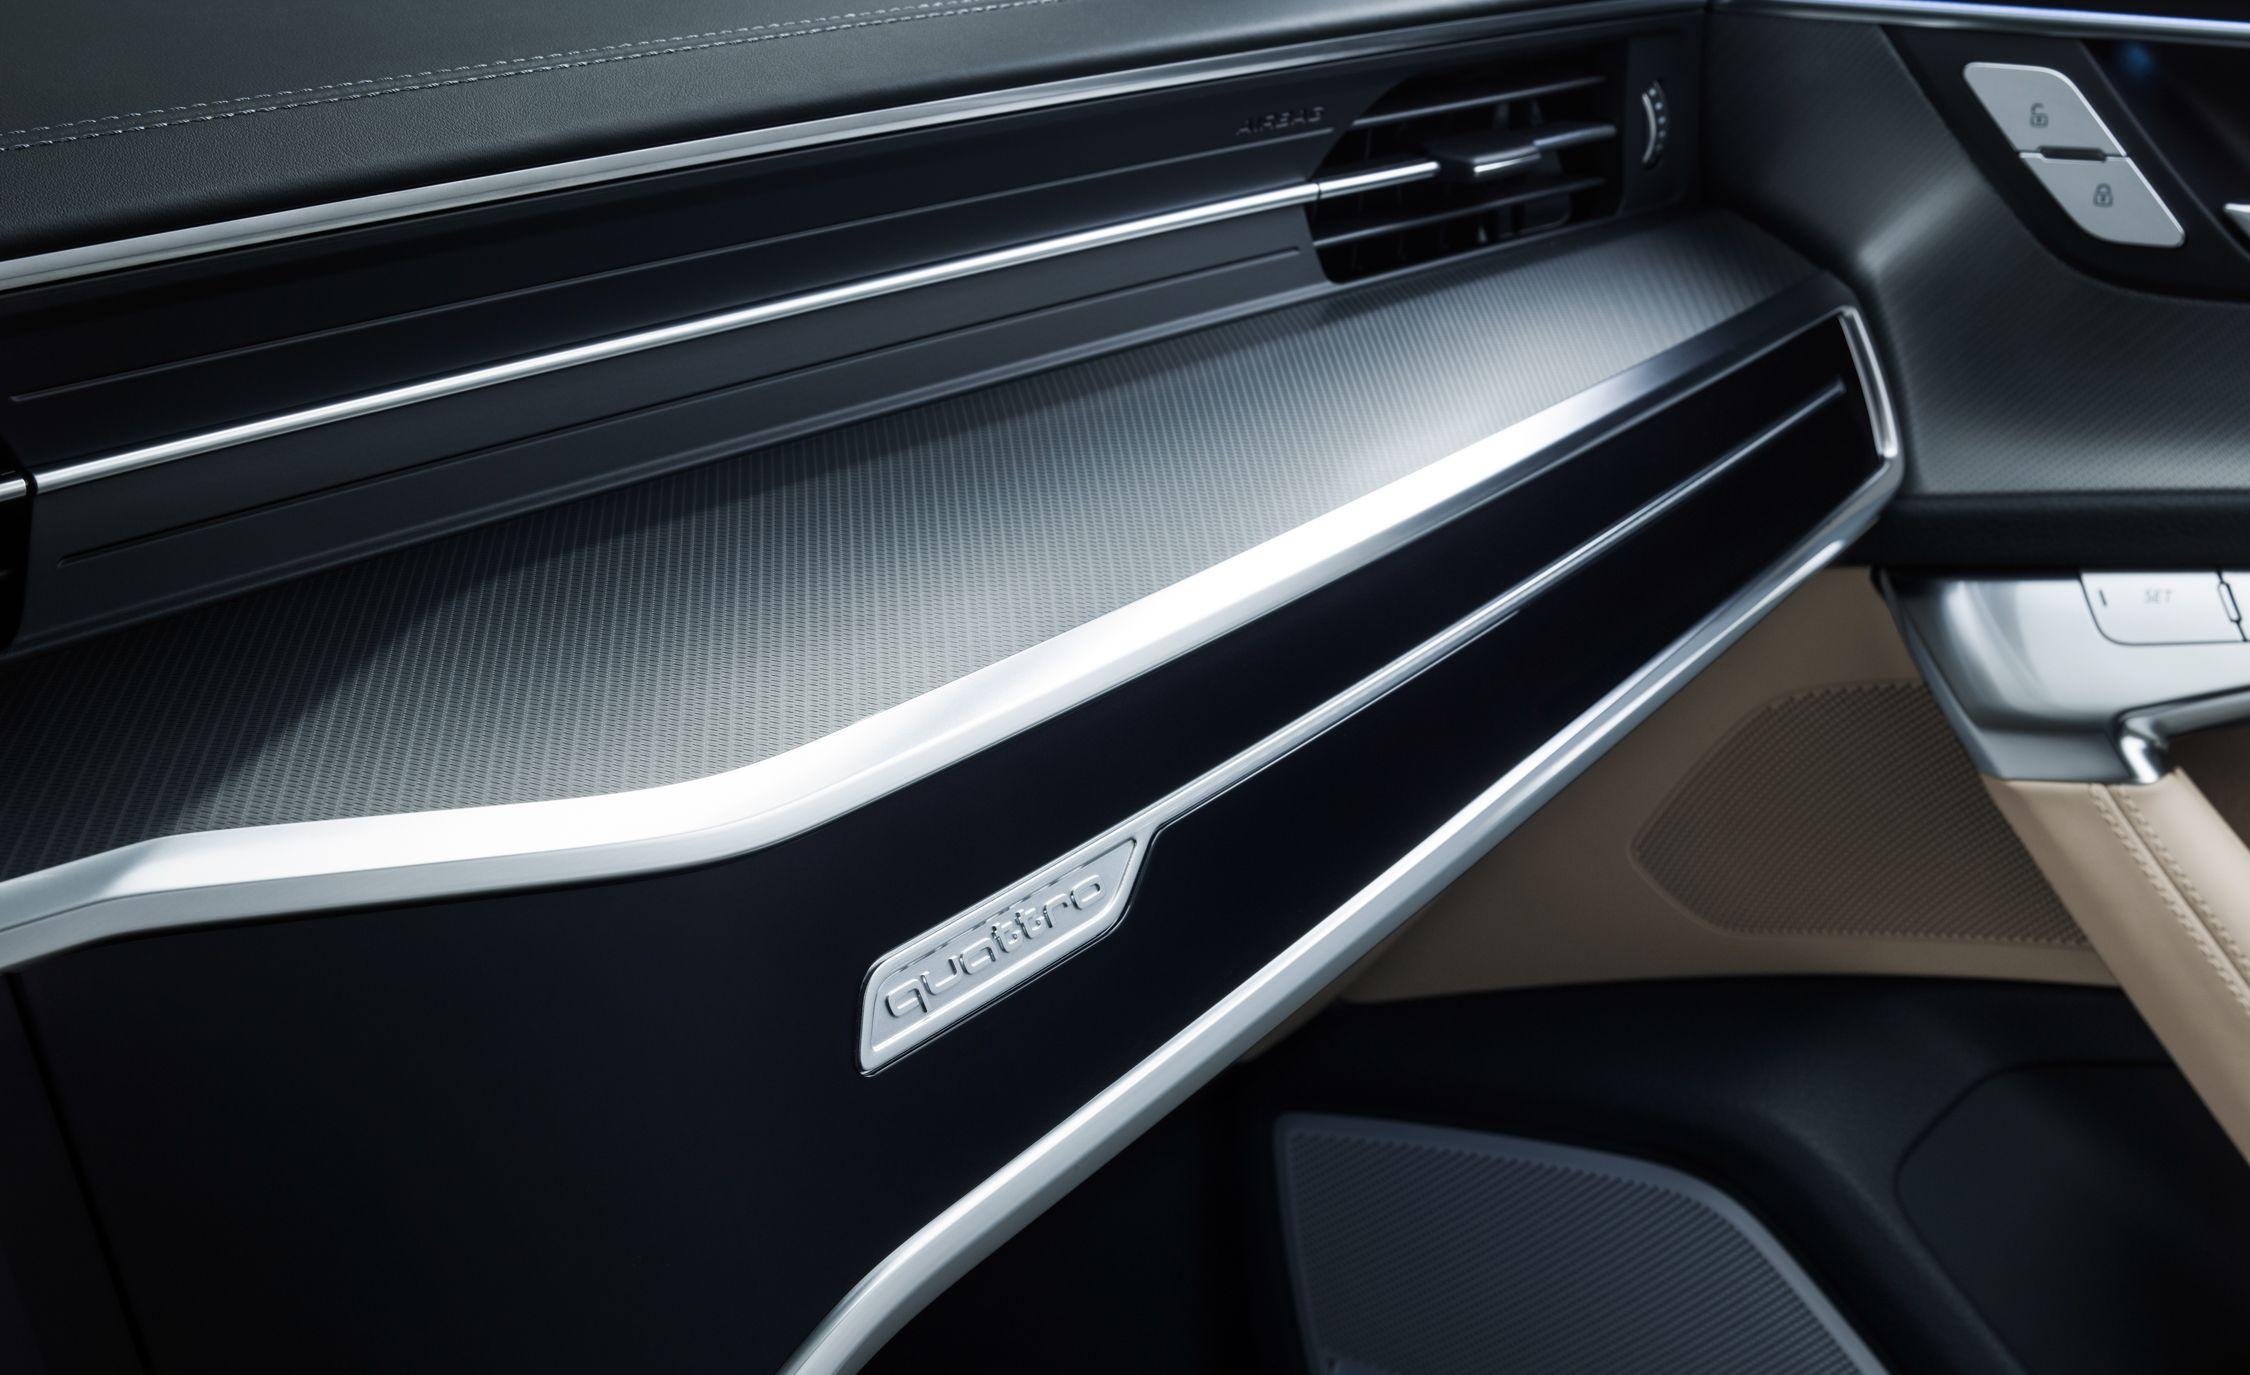 2019-Audi-A7-Sportback-159-1.jpg